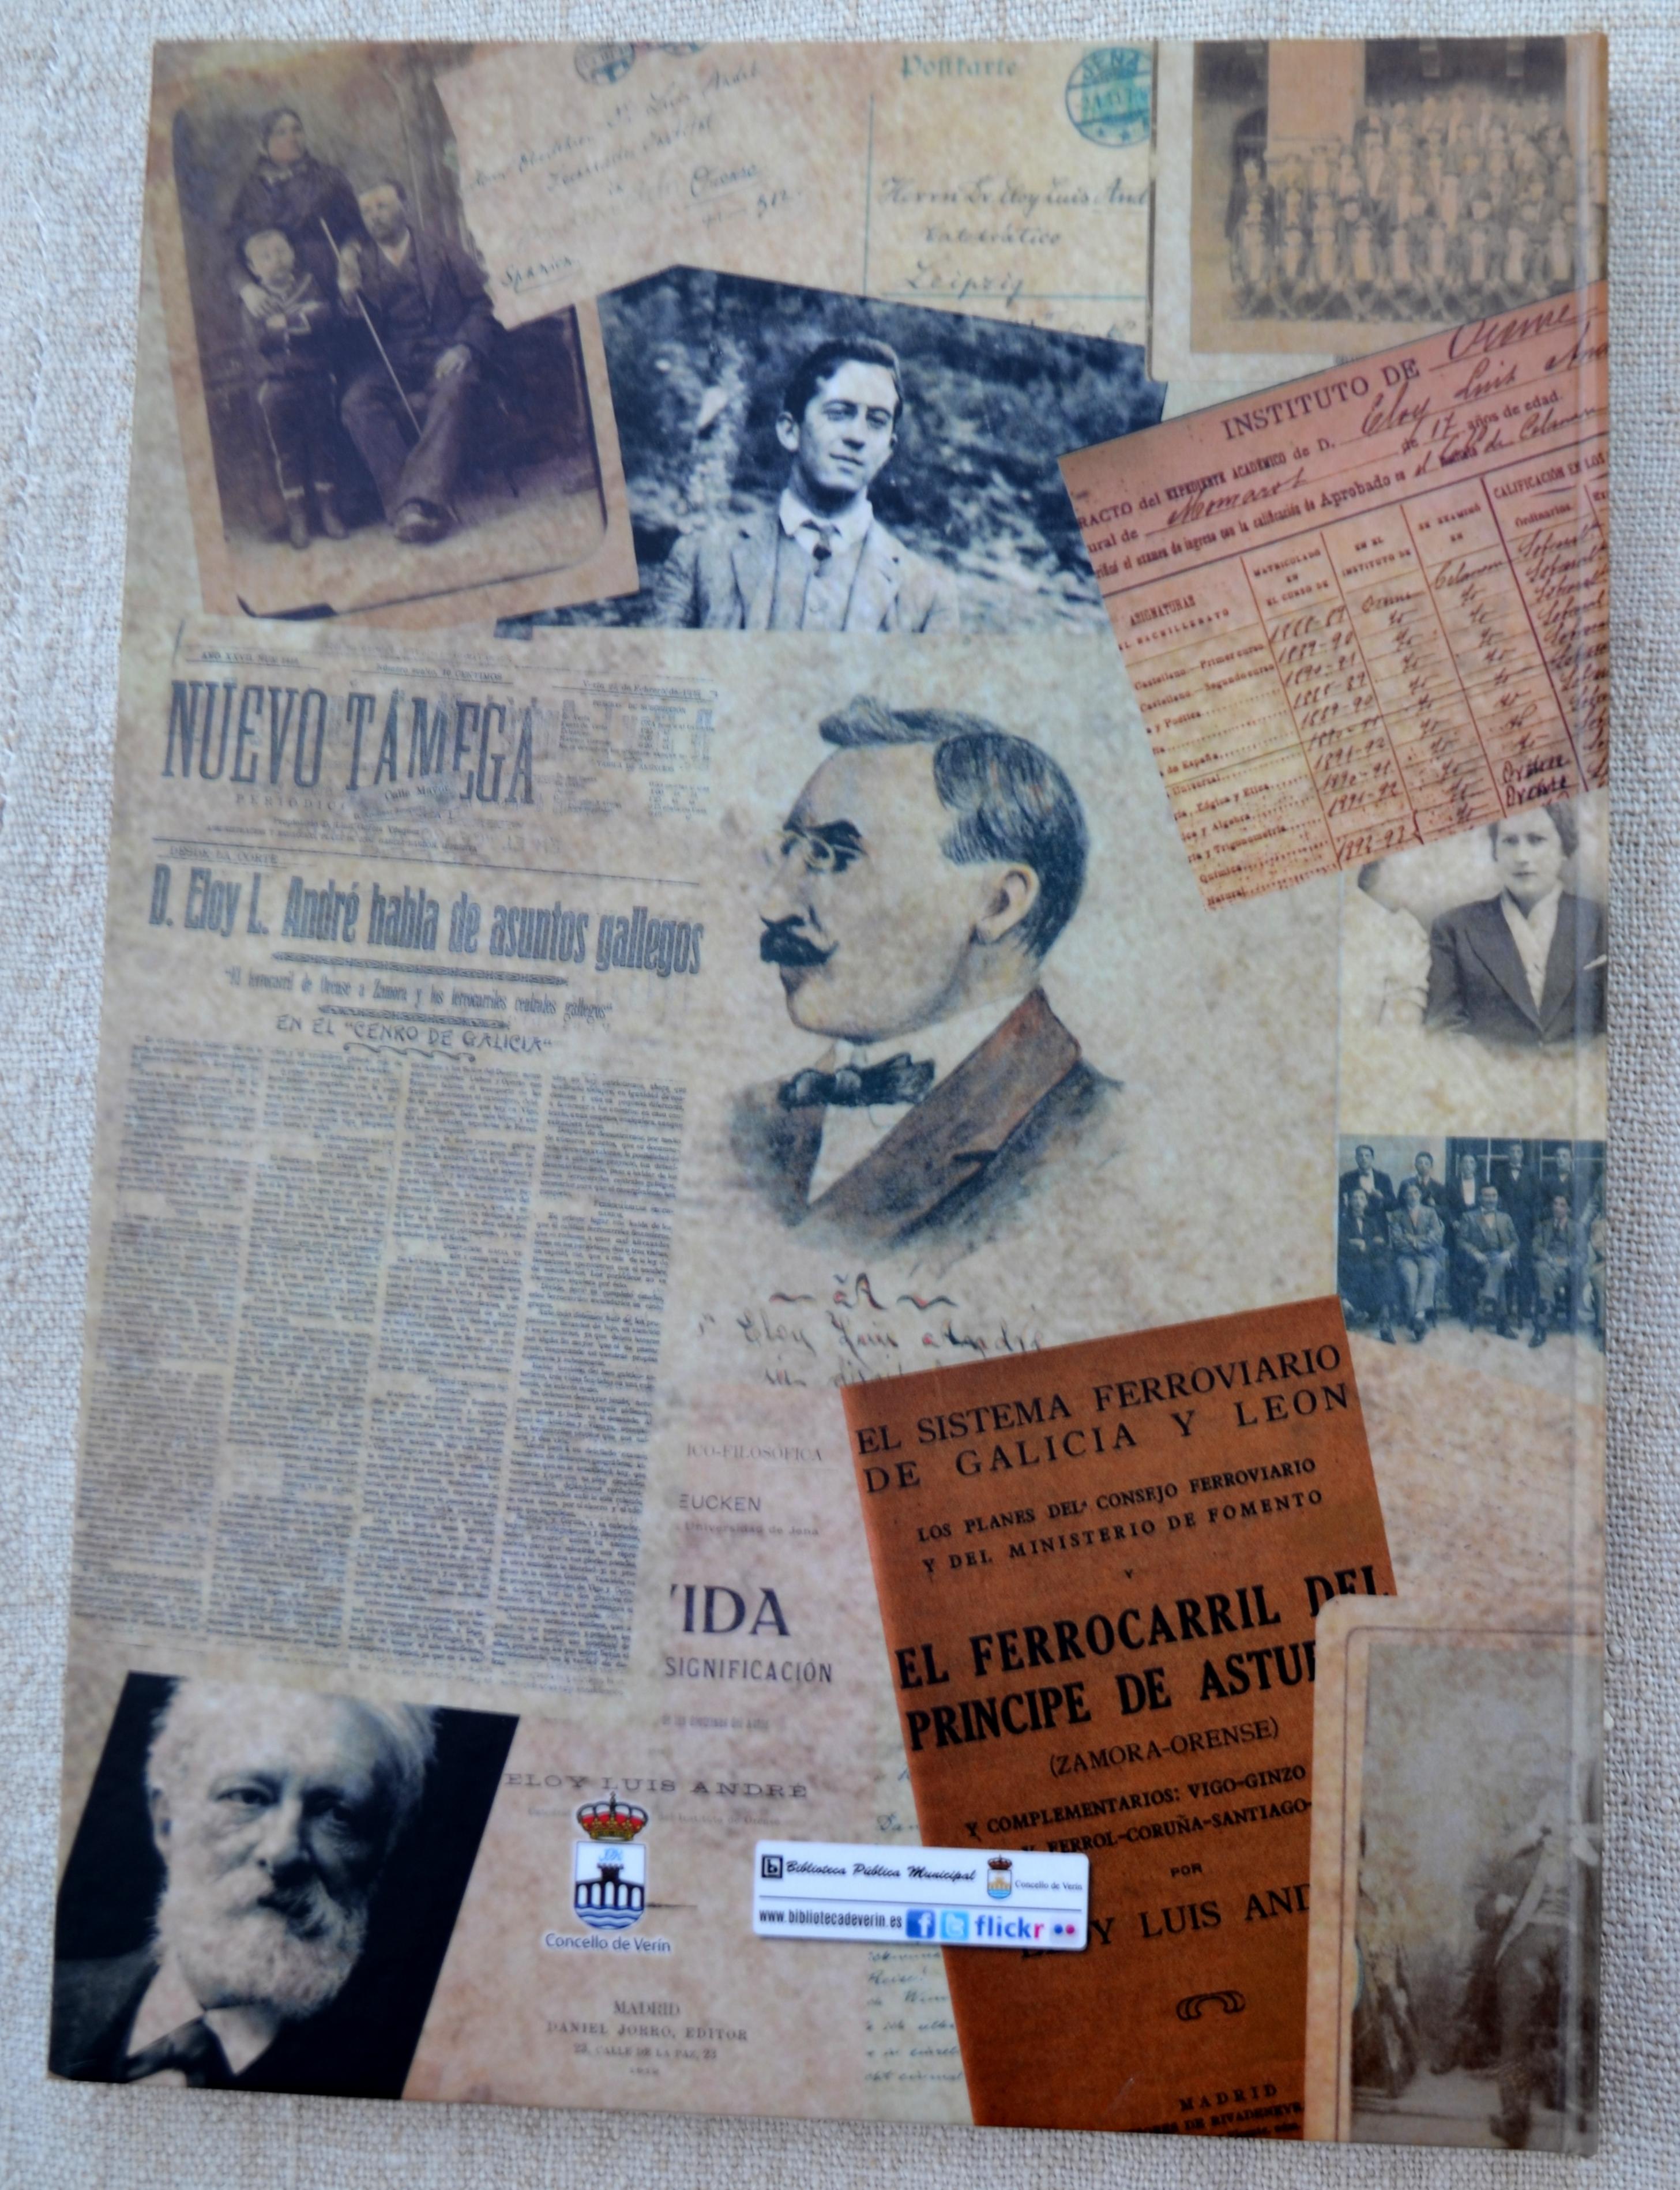 Libro sobre Eloy Luís André